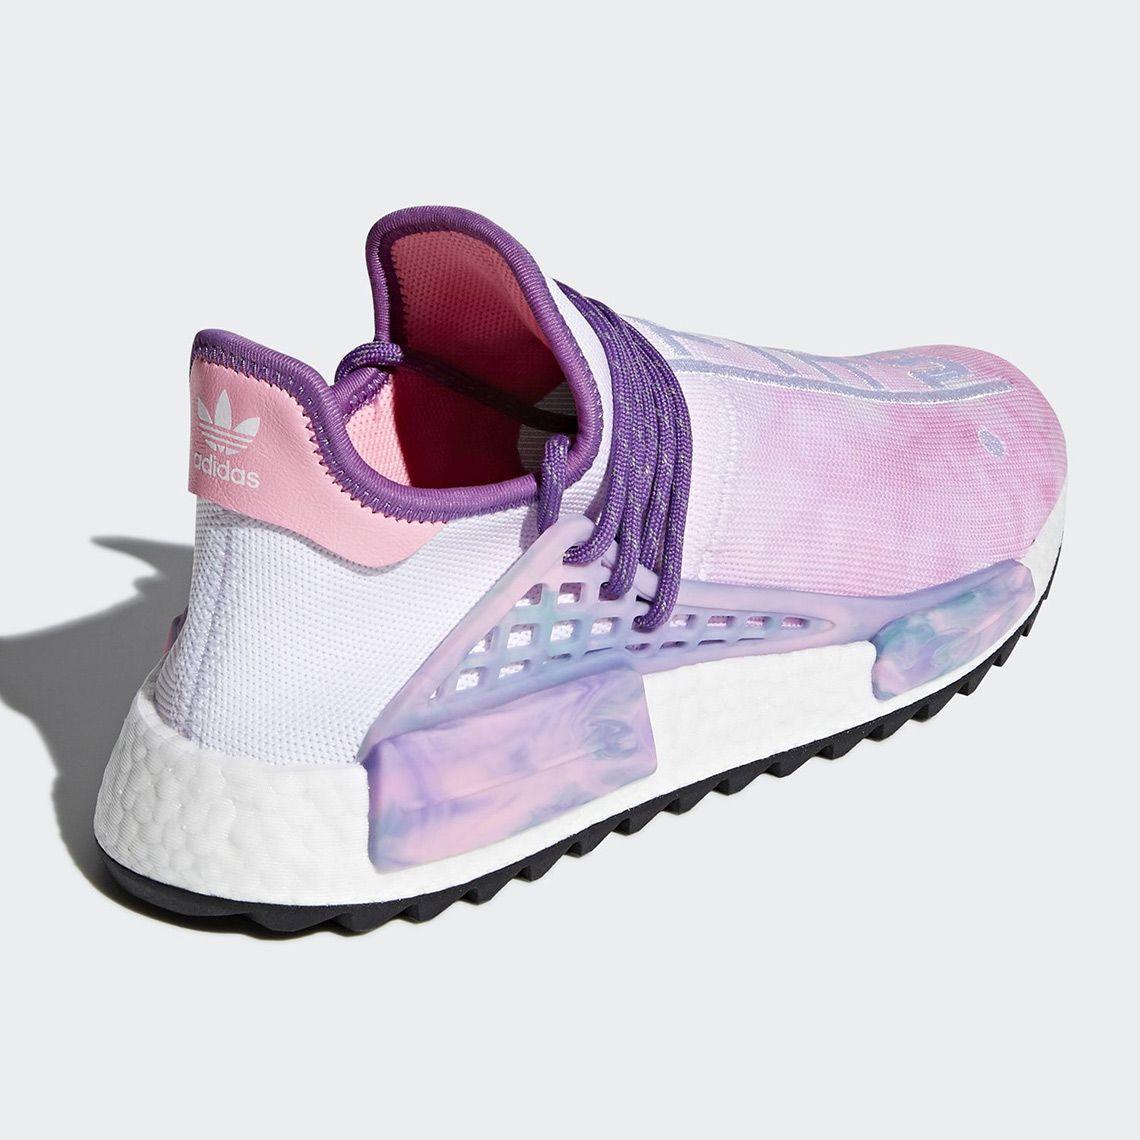 premium selection fe475 d9d79 Pharrell adidas NMD Hu Holi AC7362 Release Info  SneakerNews.com